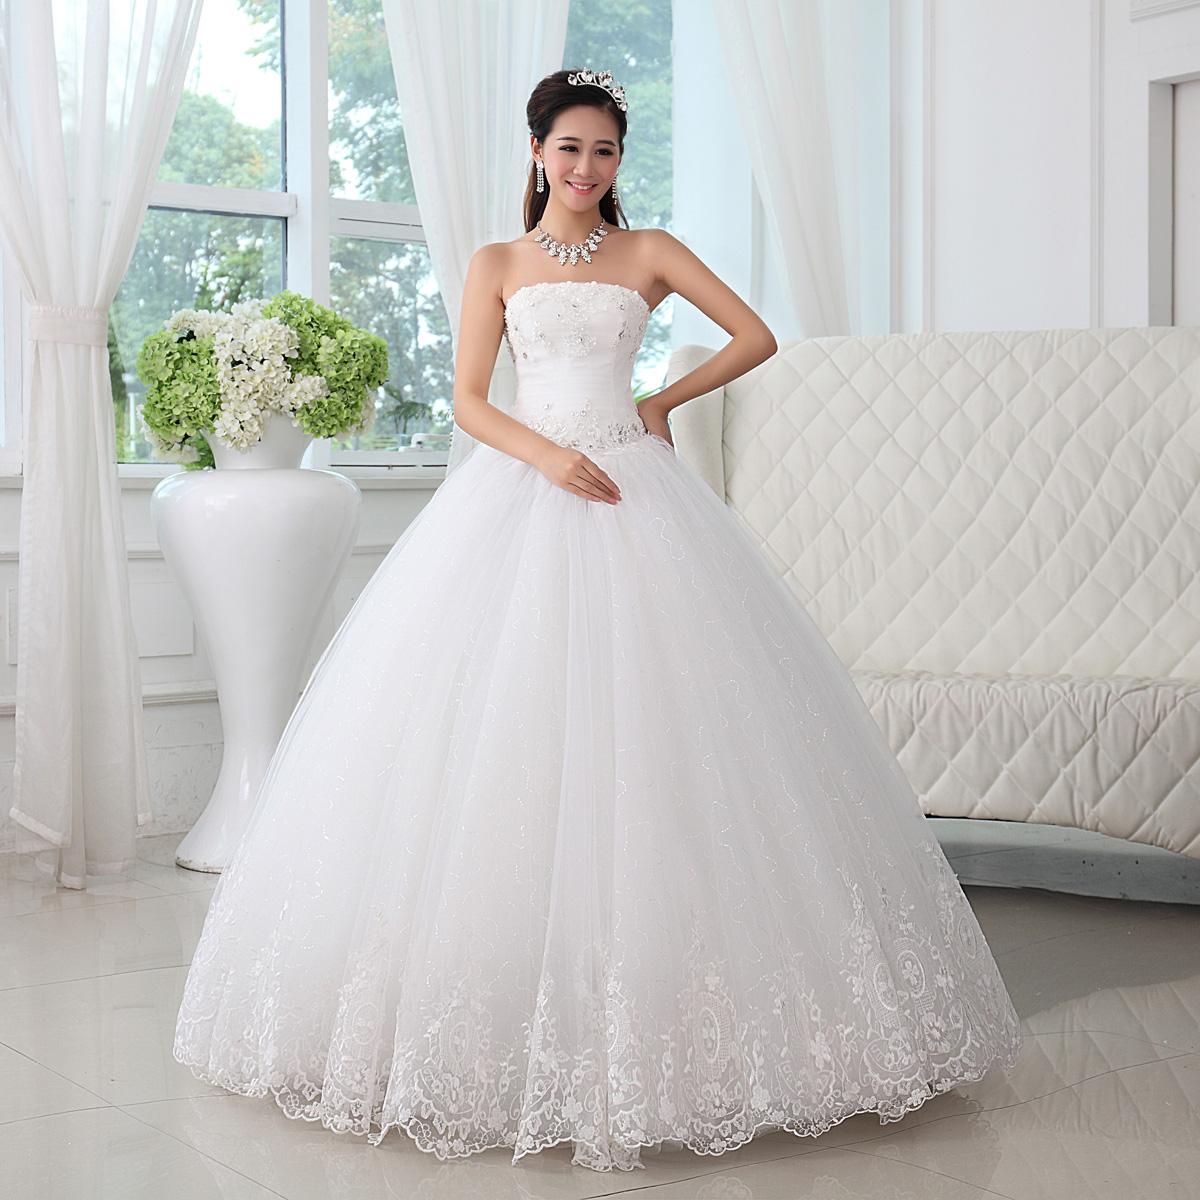 2013 bruiloft tube top trouwjurk formele trouwjurk jurk zoete prinses ...